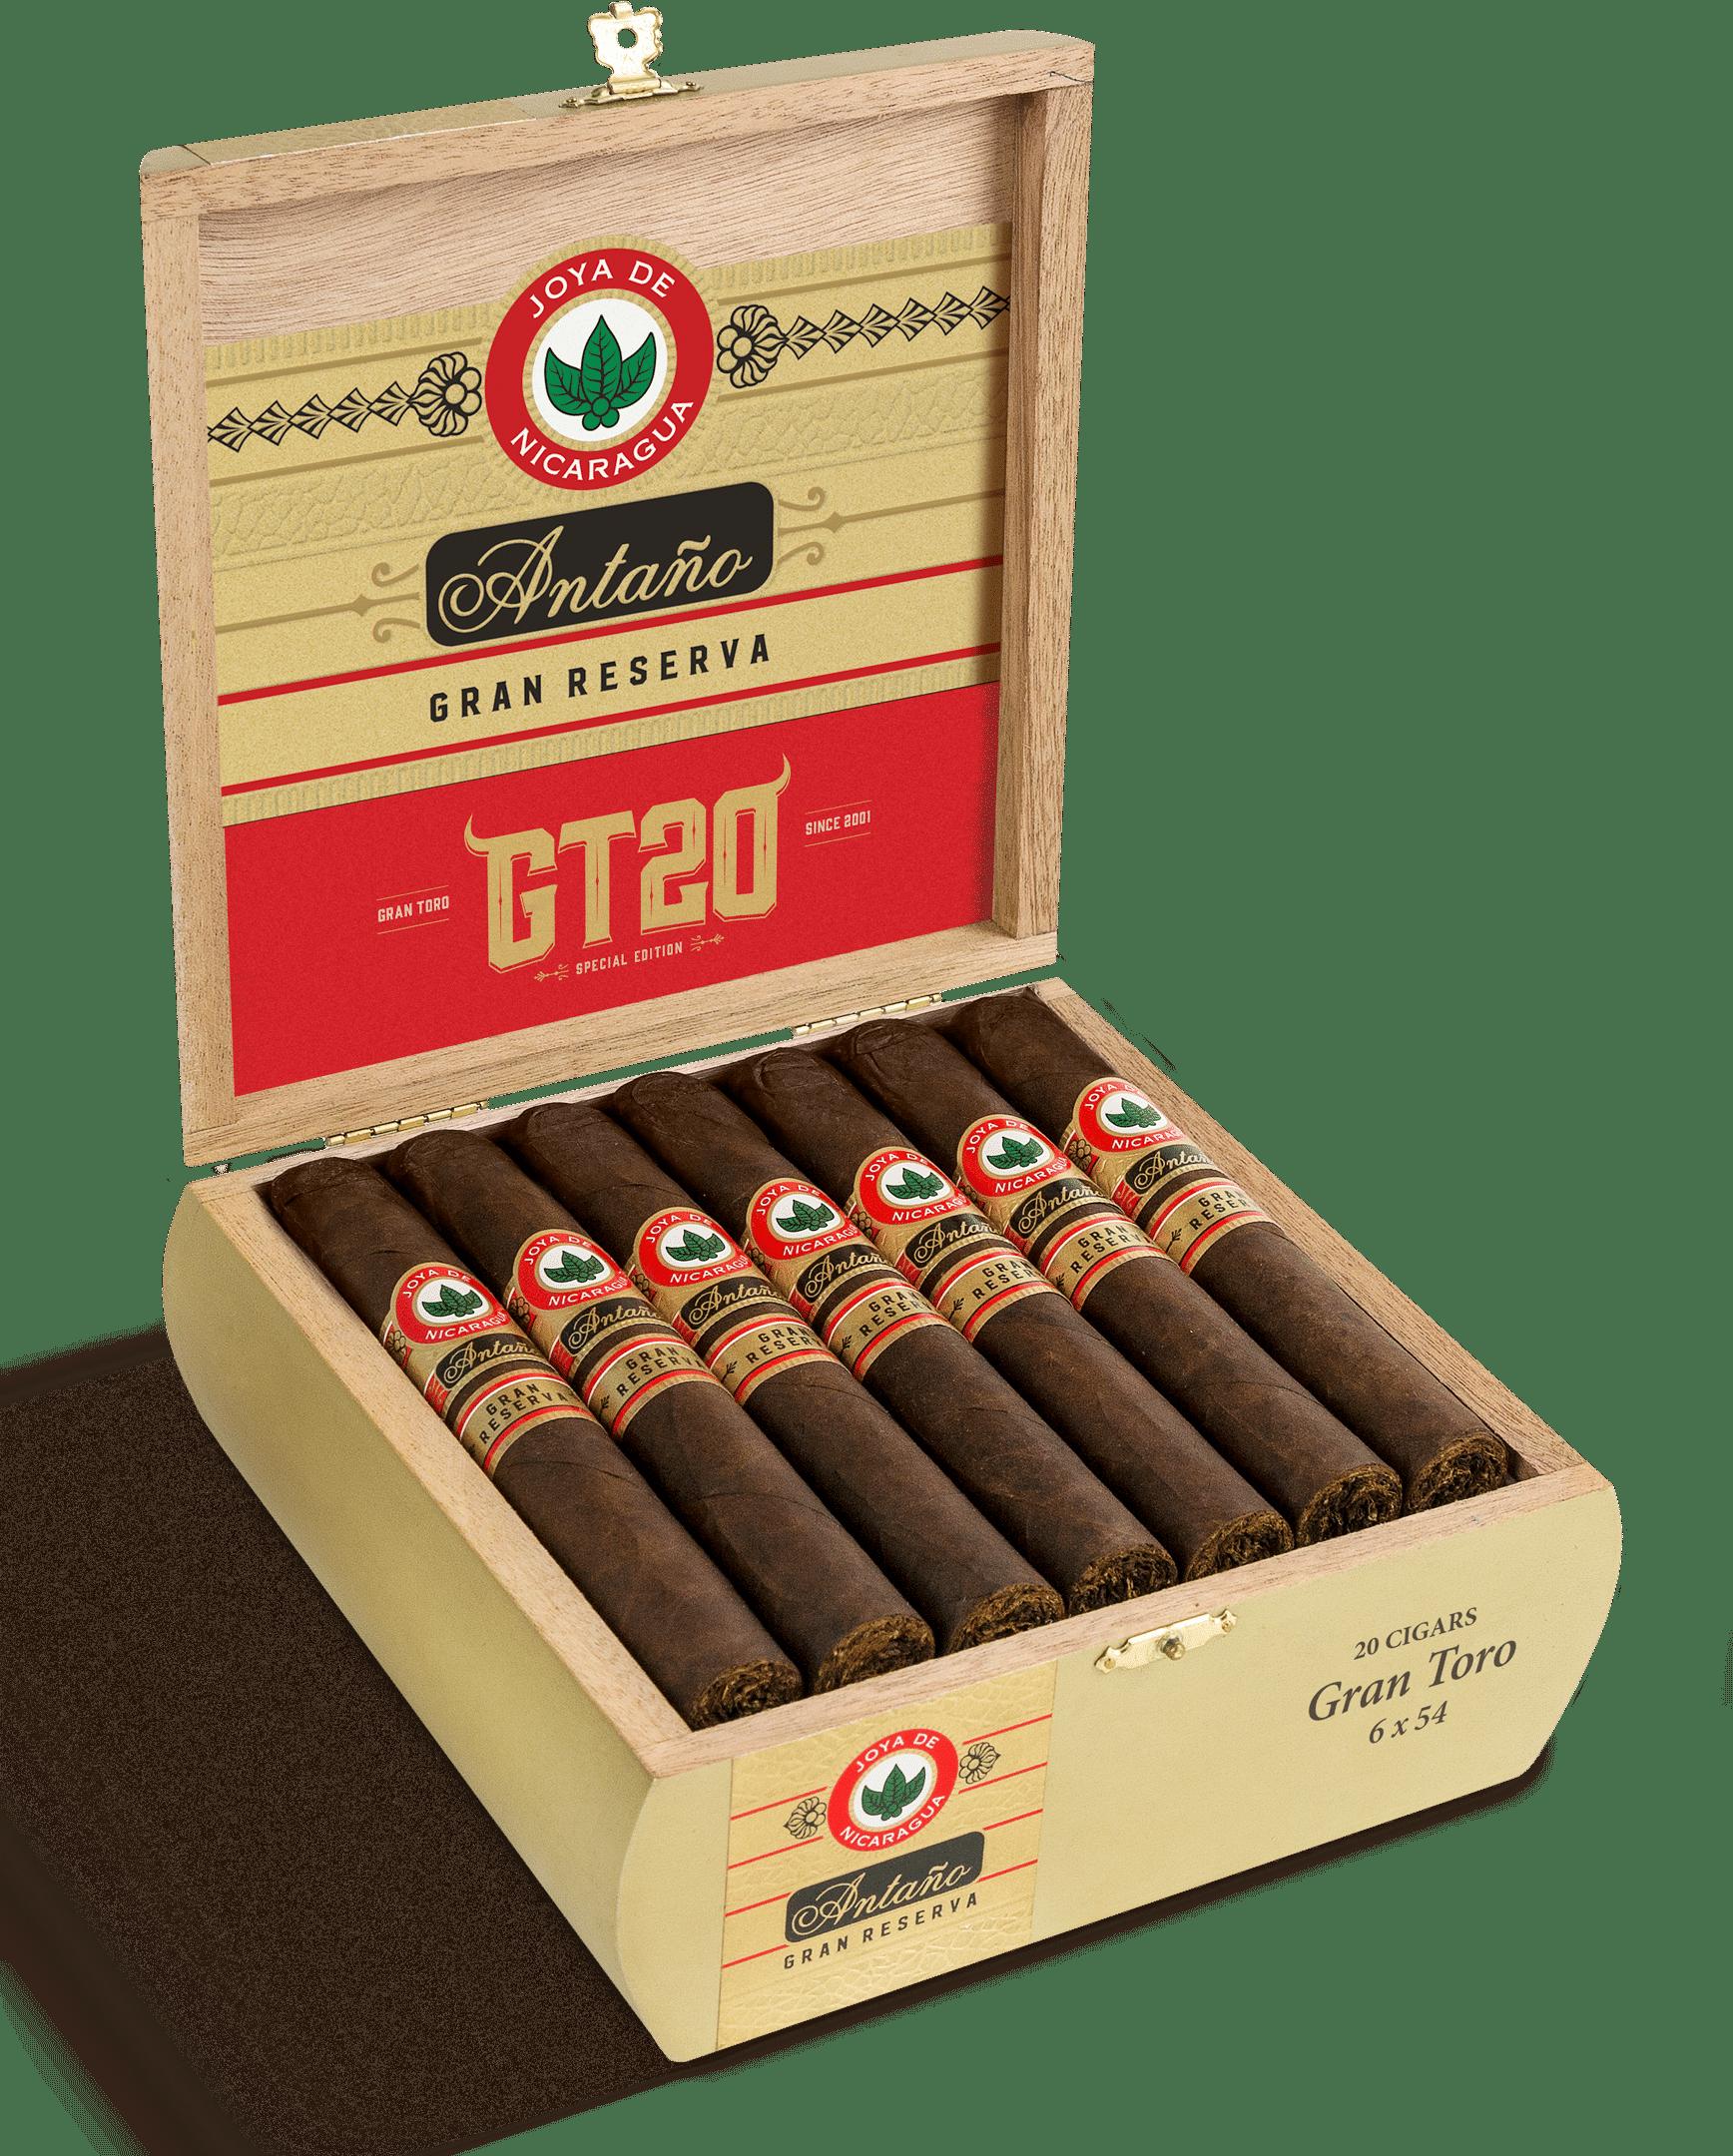 Cigar News: Joya De Nicaragua Announces Antaño Gran Reserva GT20